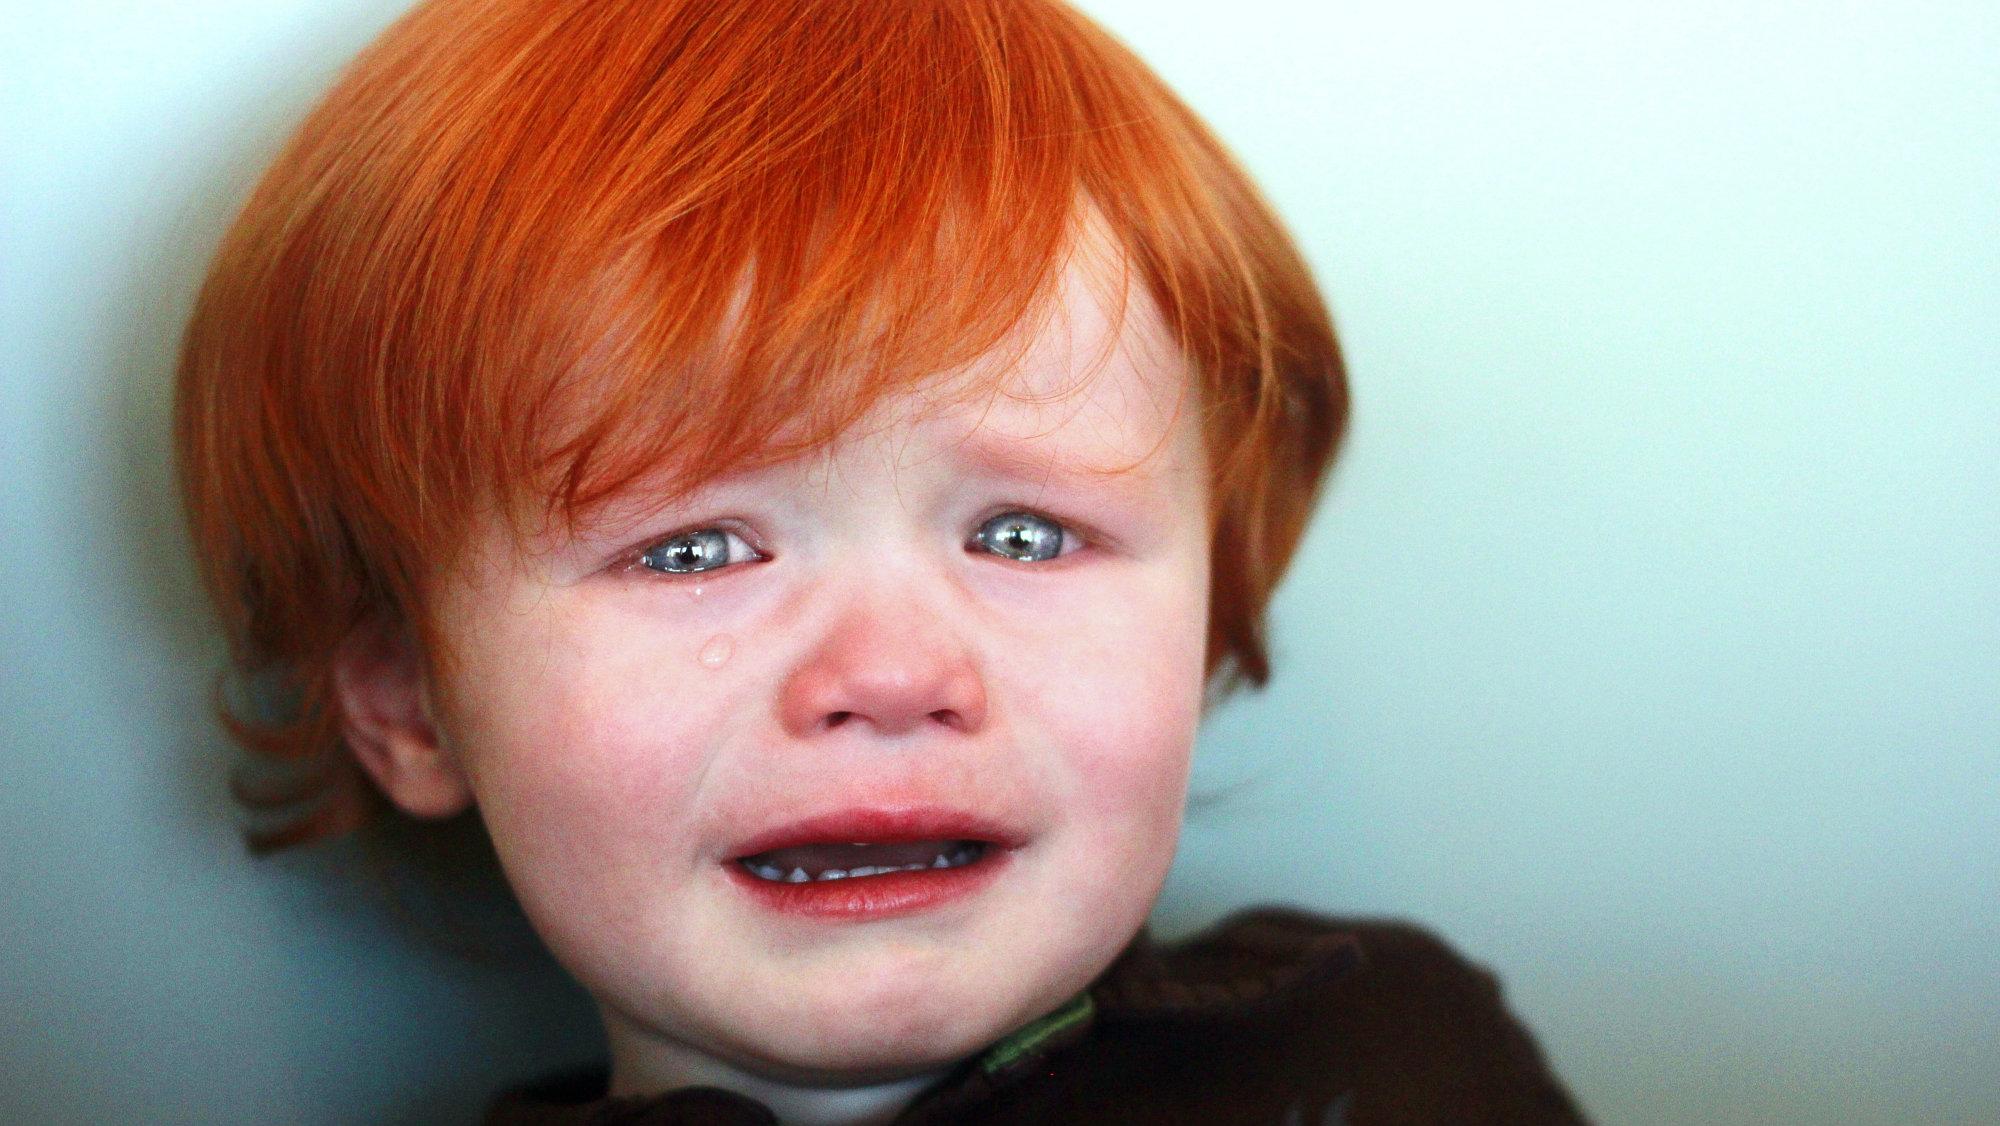 iceland-baby-crying